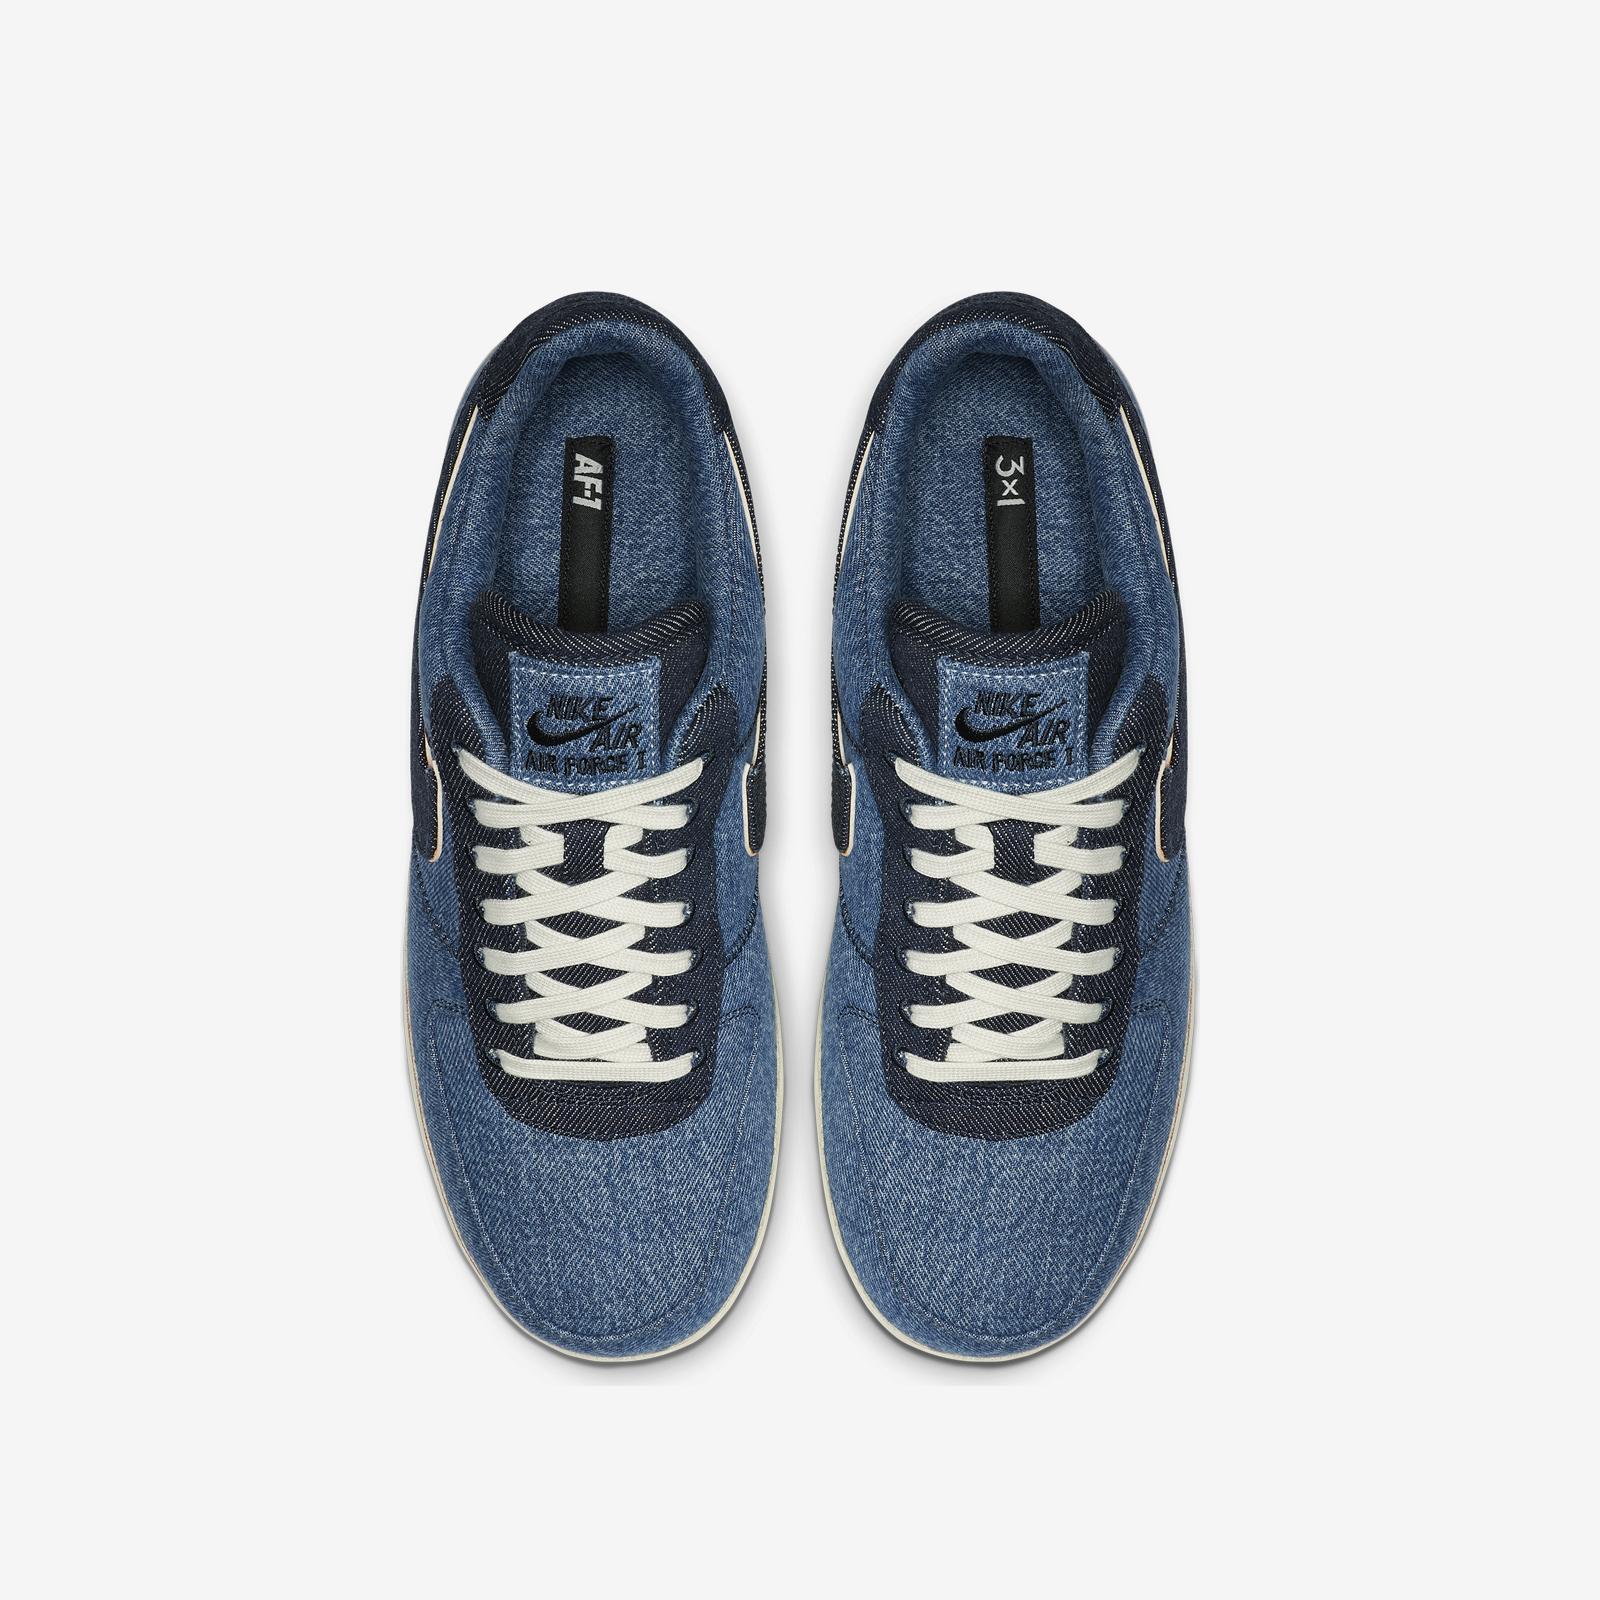 Nike Air Force 1 07 Premium 905345 403 Sneakersnstuff